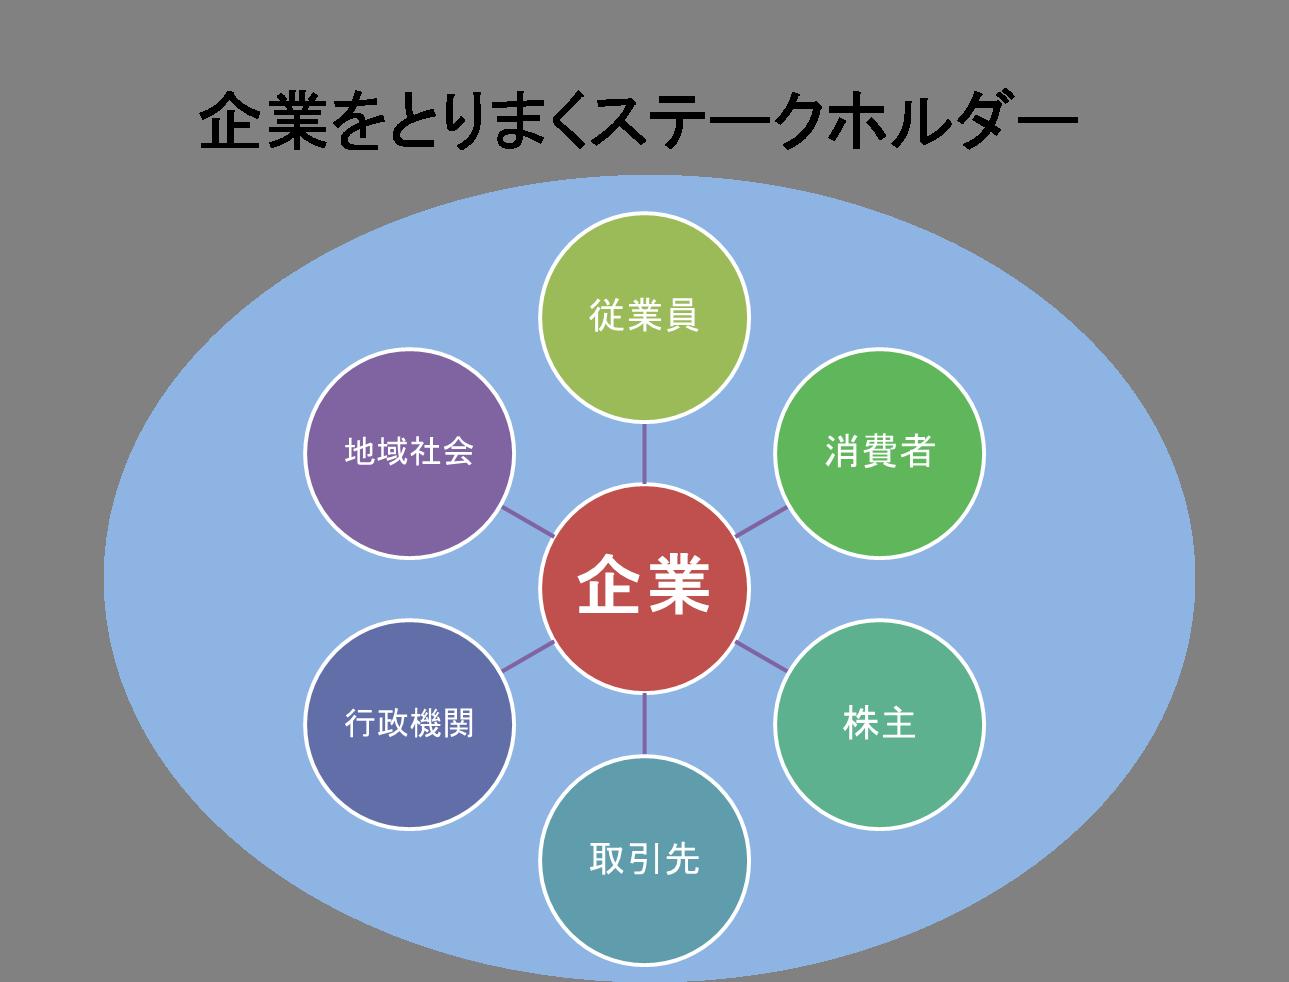 CSR(企業の社会的責任)